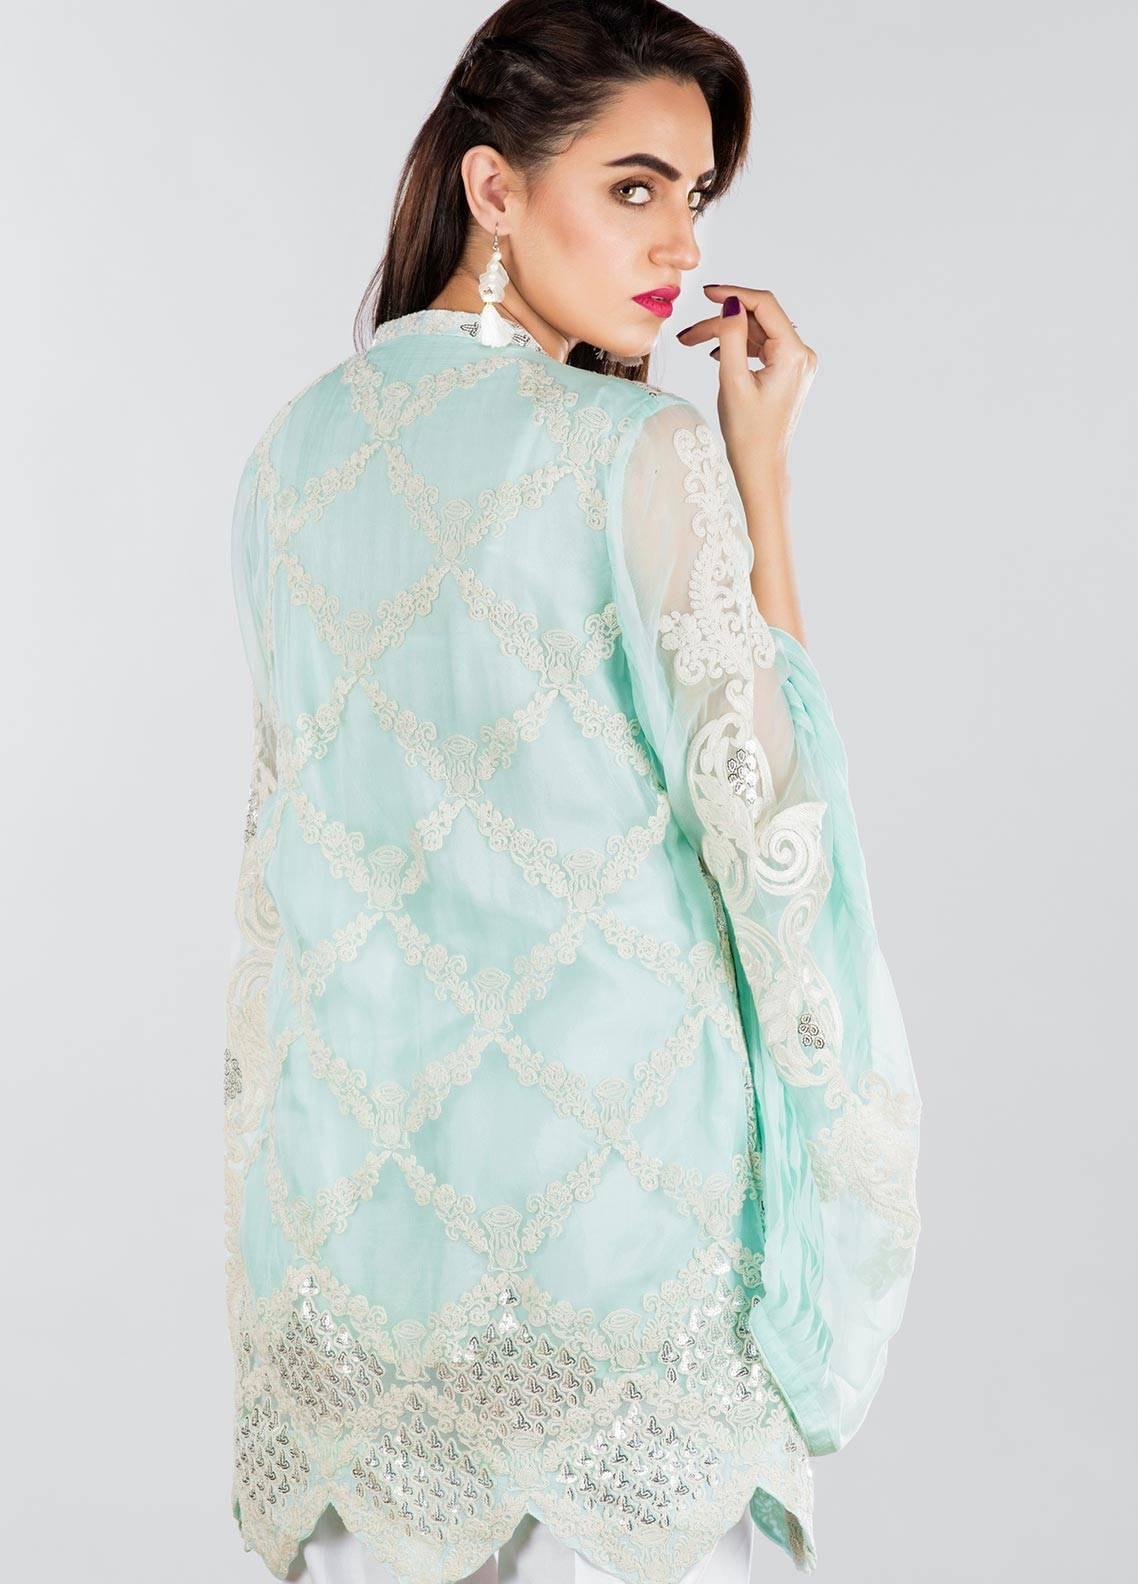 Sheqe Embroidered  Stitched Kurtis SHQ18K C-004 BLUE